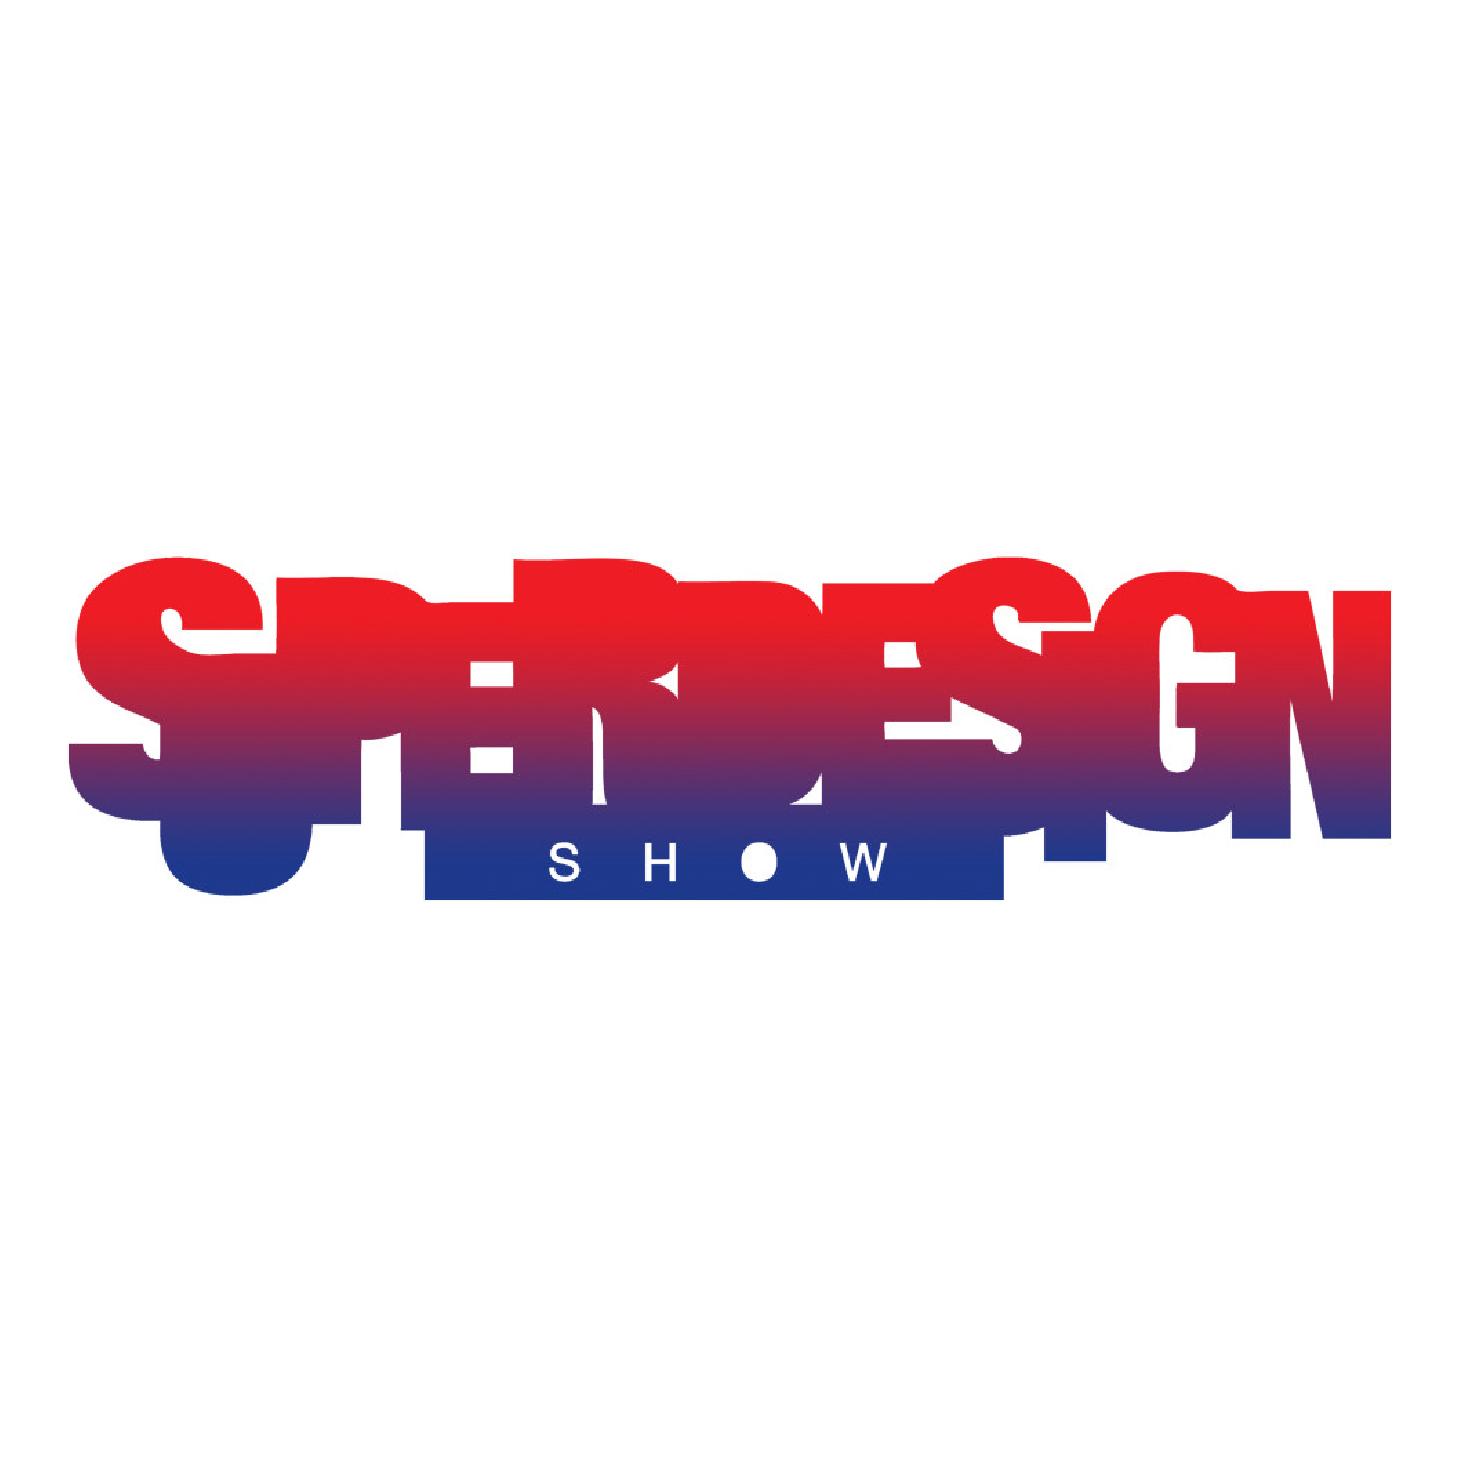 SUPERSTUDIO – FUORISALONE, MDW 2015 CREATIVE DIRECTOR